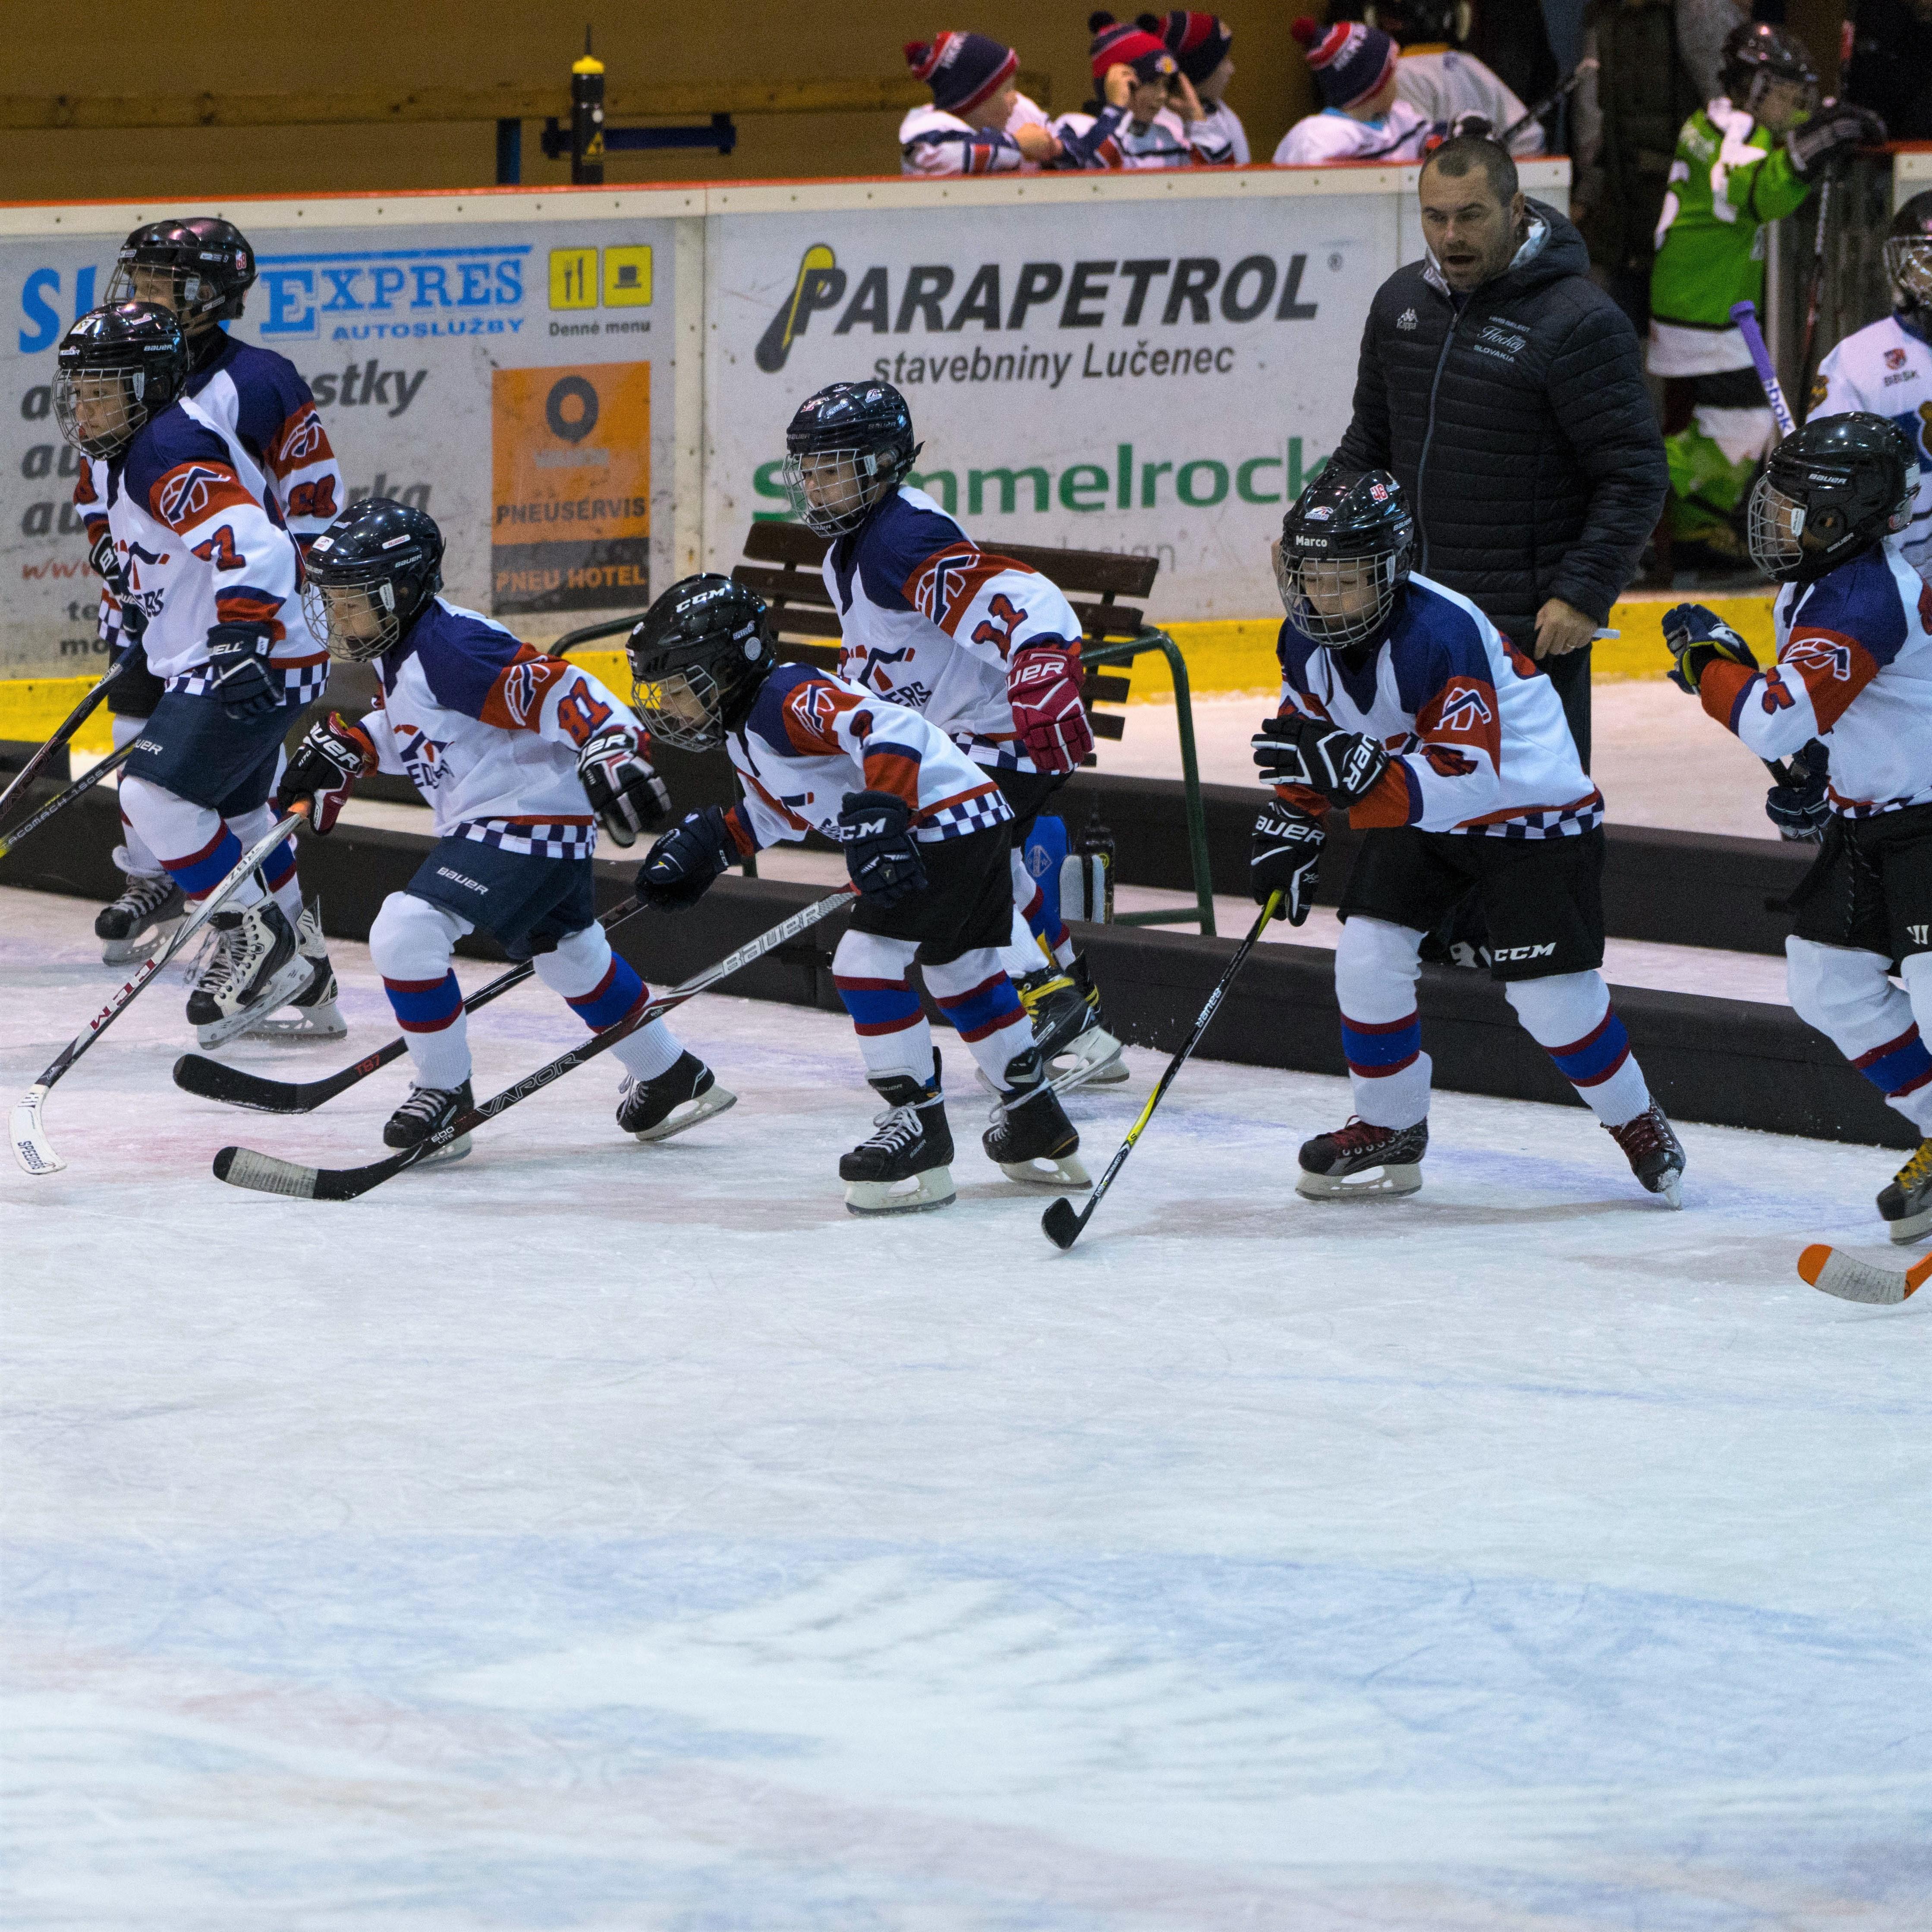 Speeders_sezona 2018_19 hokej turnaj lucenec 1